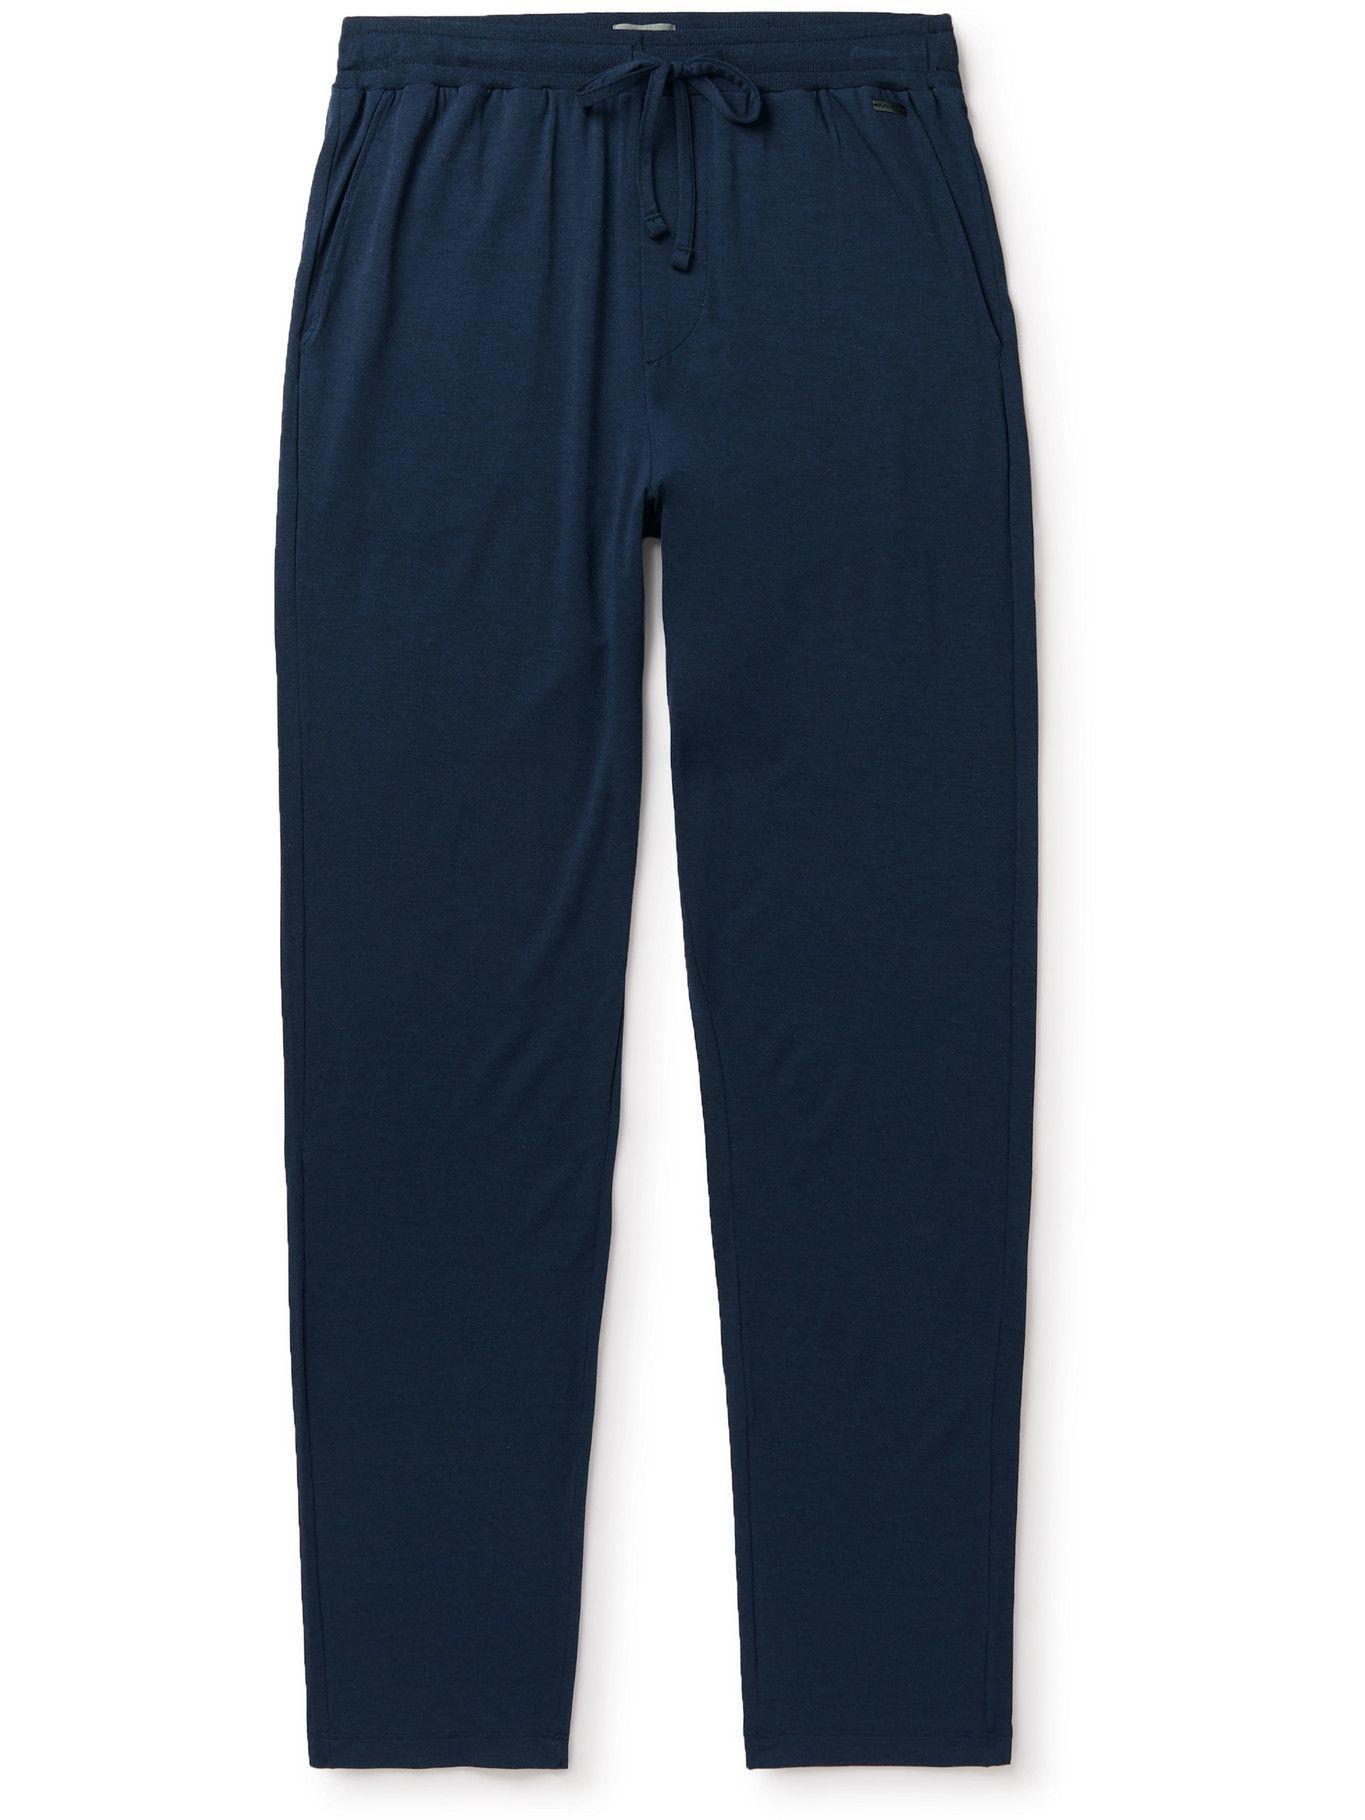 Hanro - Stretch-Jersey Pyjama Trousers - Blue